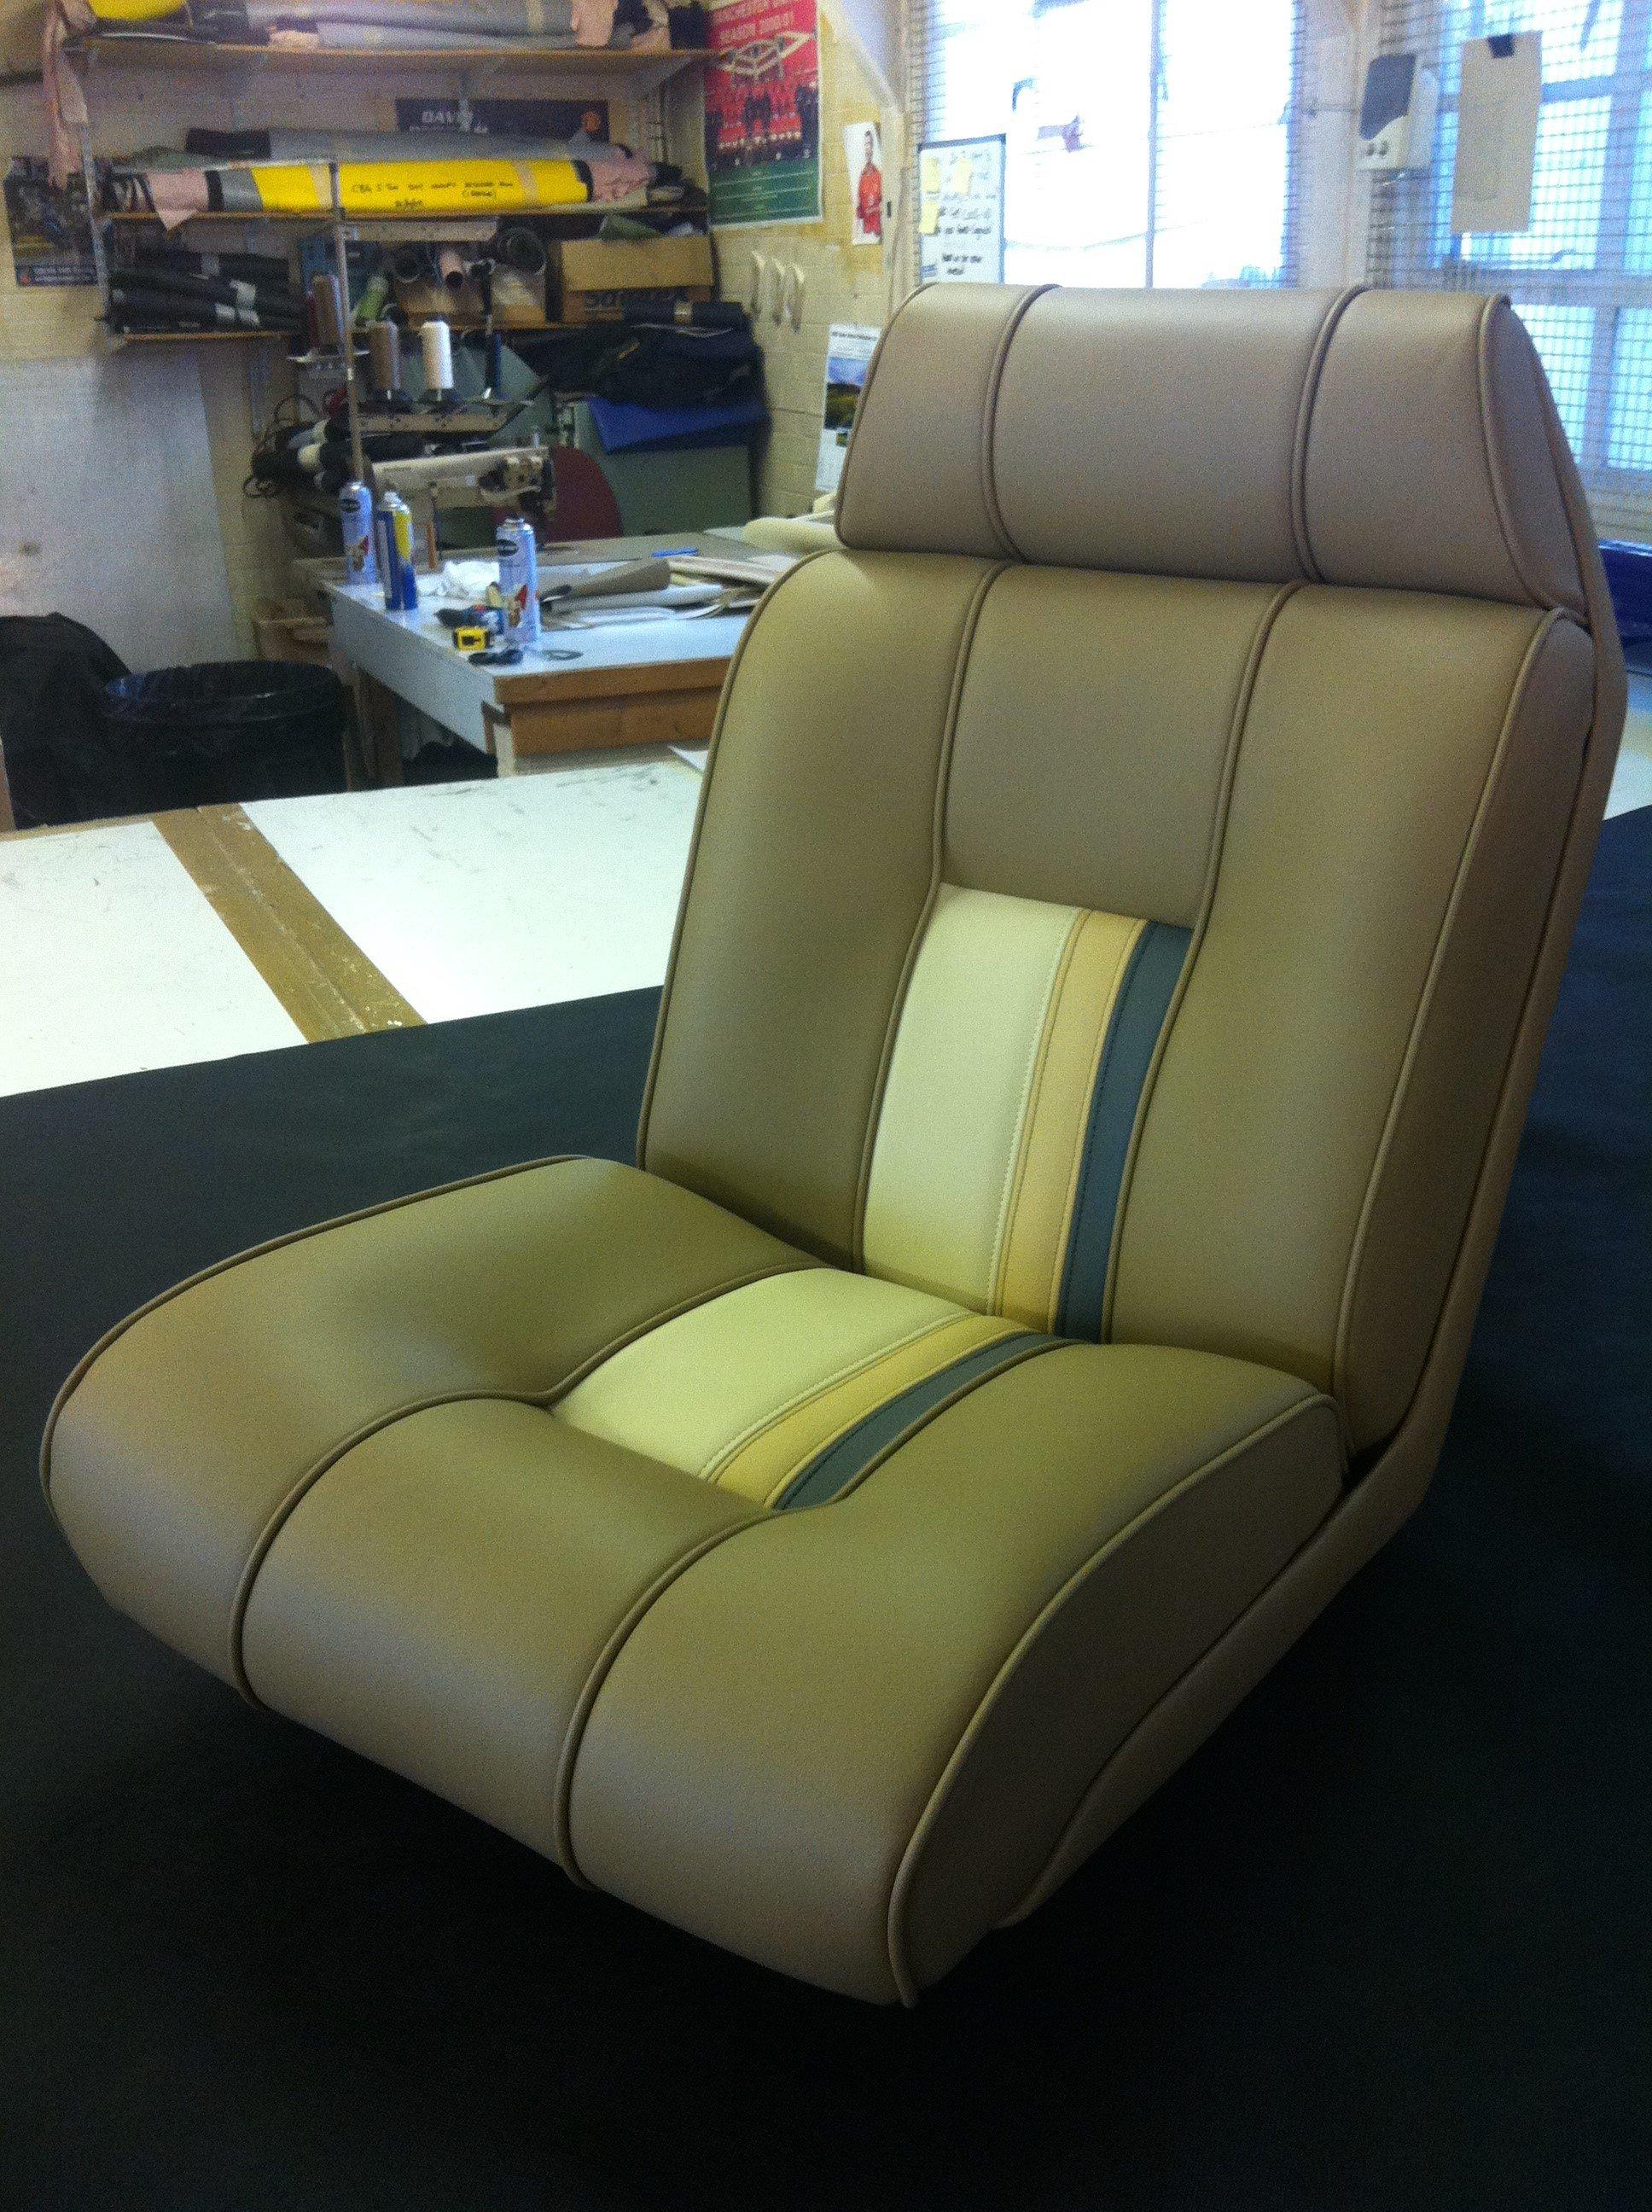 Vehicle upholstery